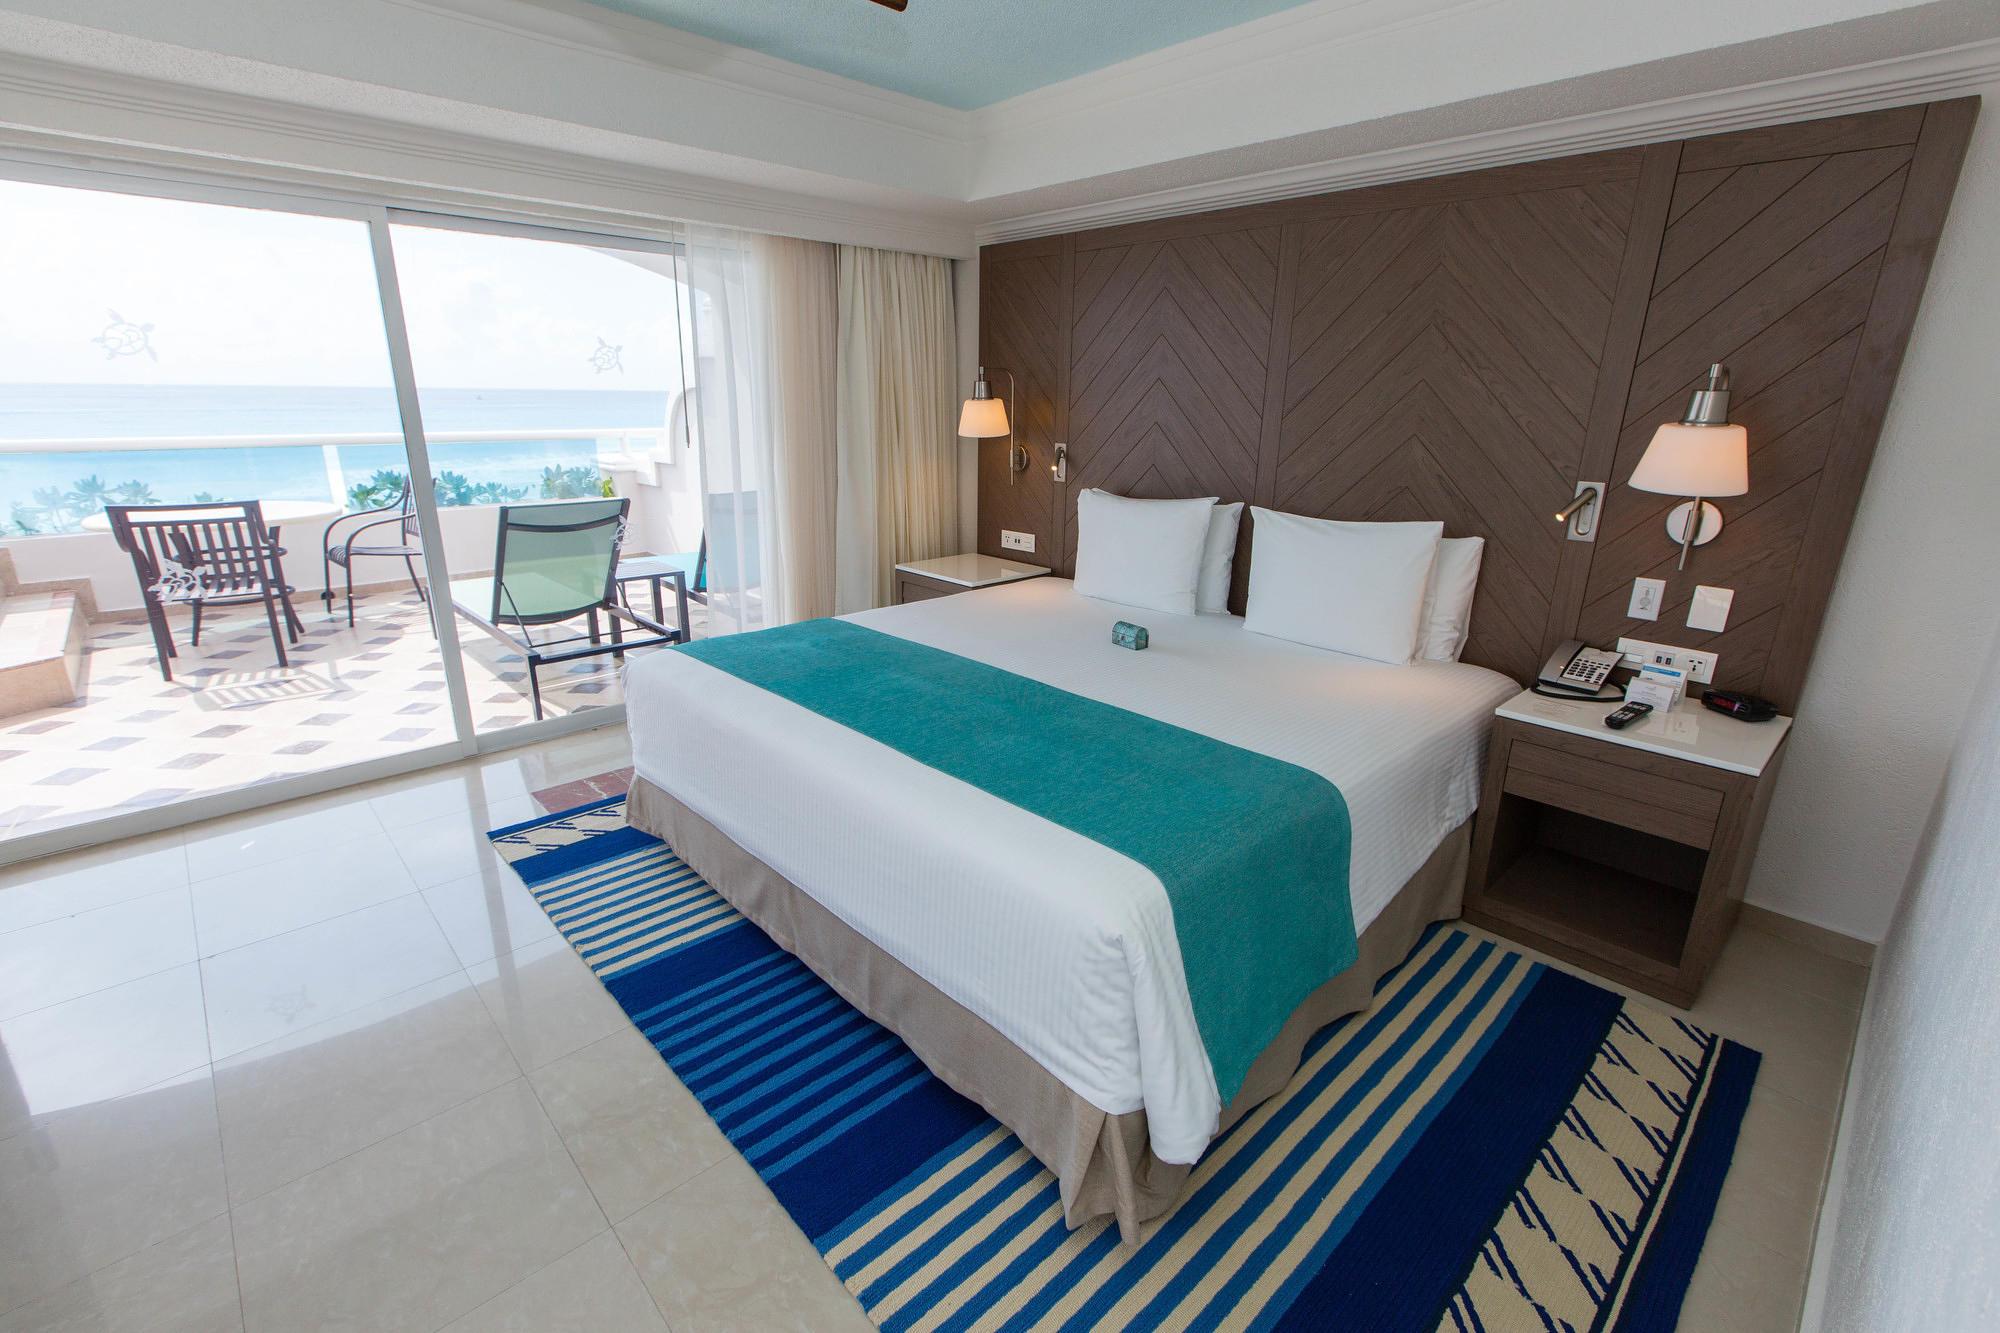 The Grand Master Ocean Front Room at Panama Jack Resorts Cancun